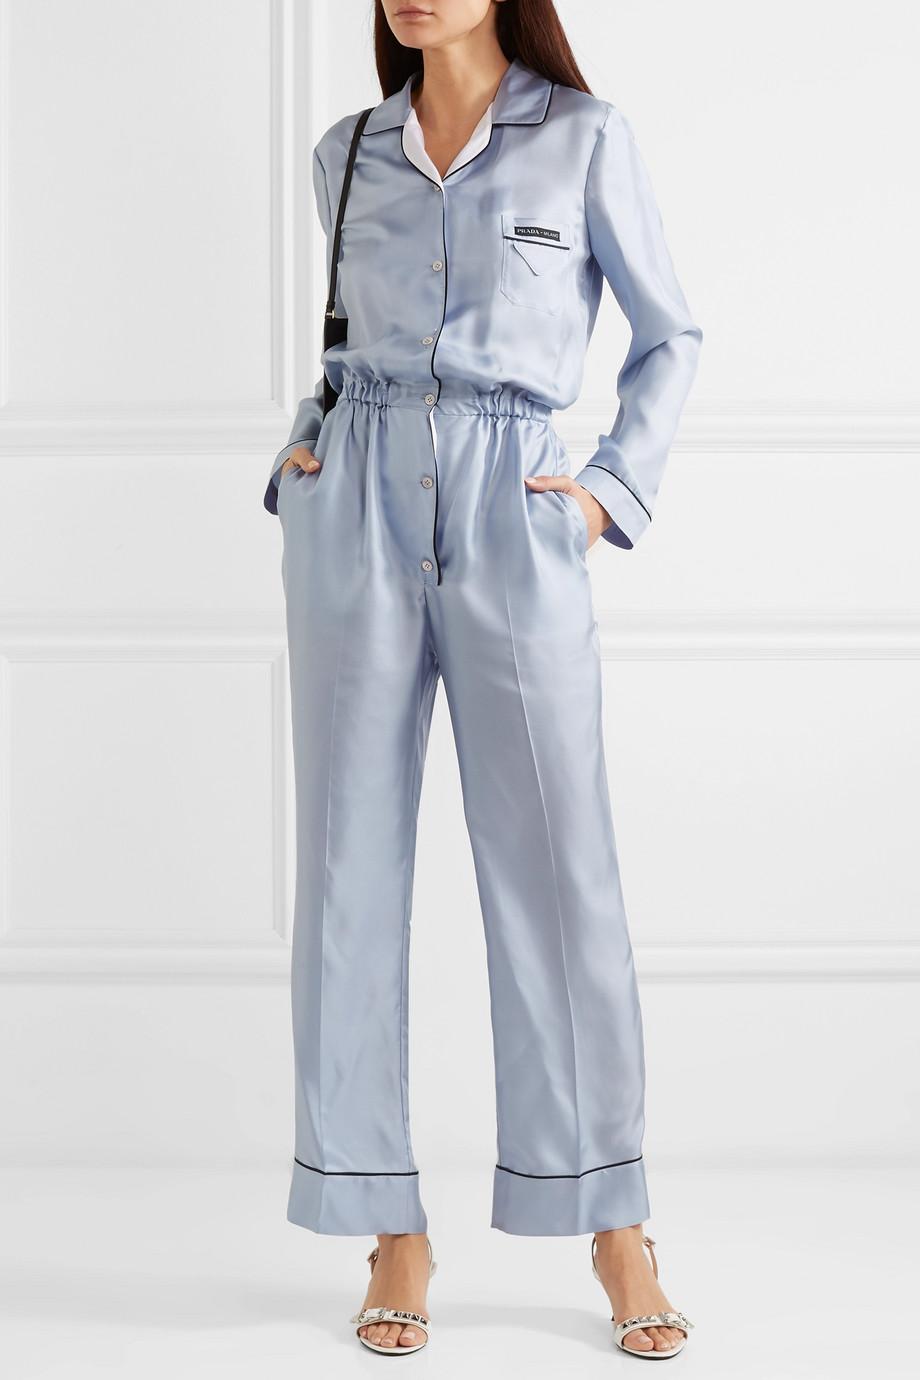 Prada Combi-pantalon en serge de soie